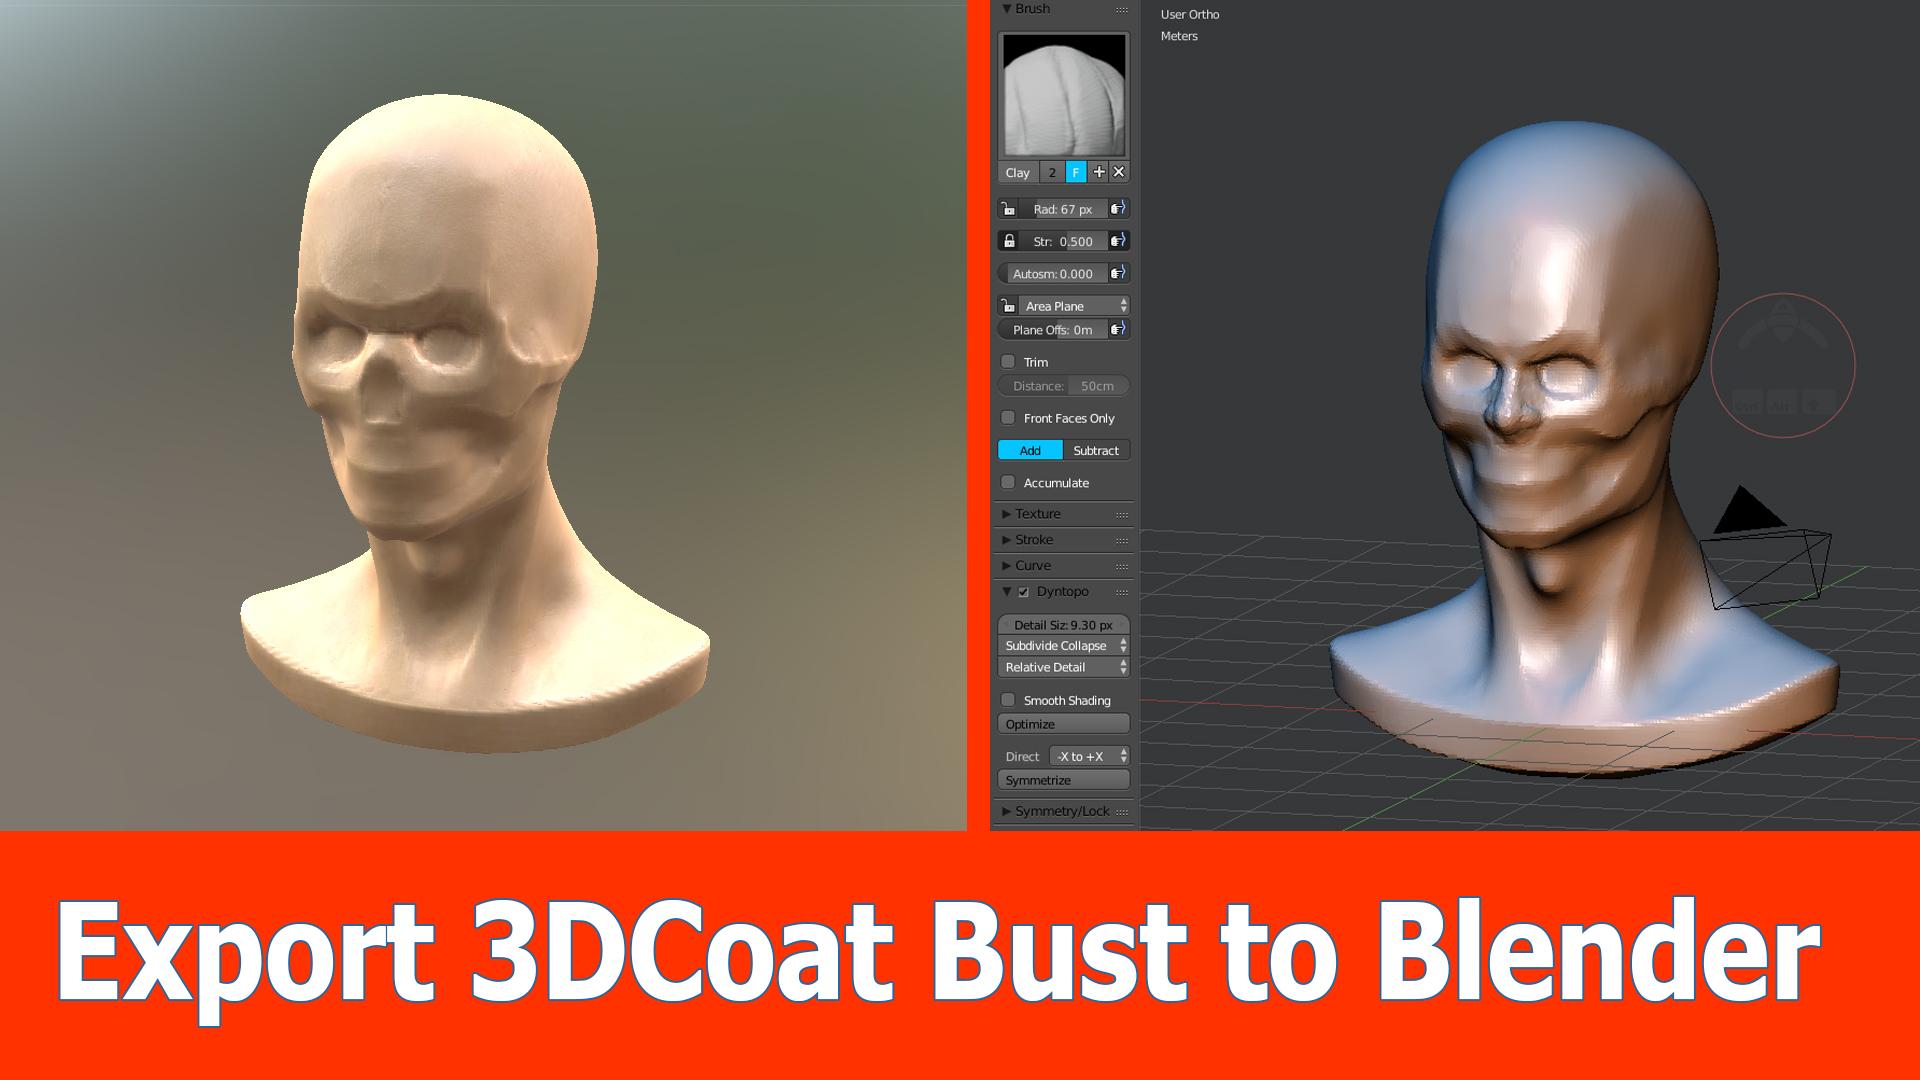 3D-Coat Bust to Blender for Sculpting - BlenderNation